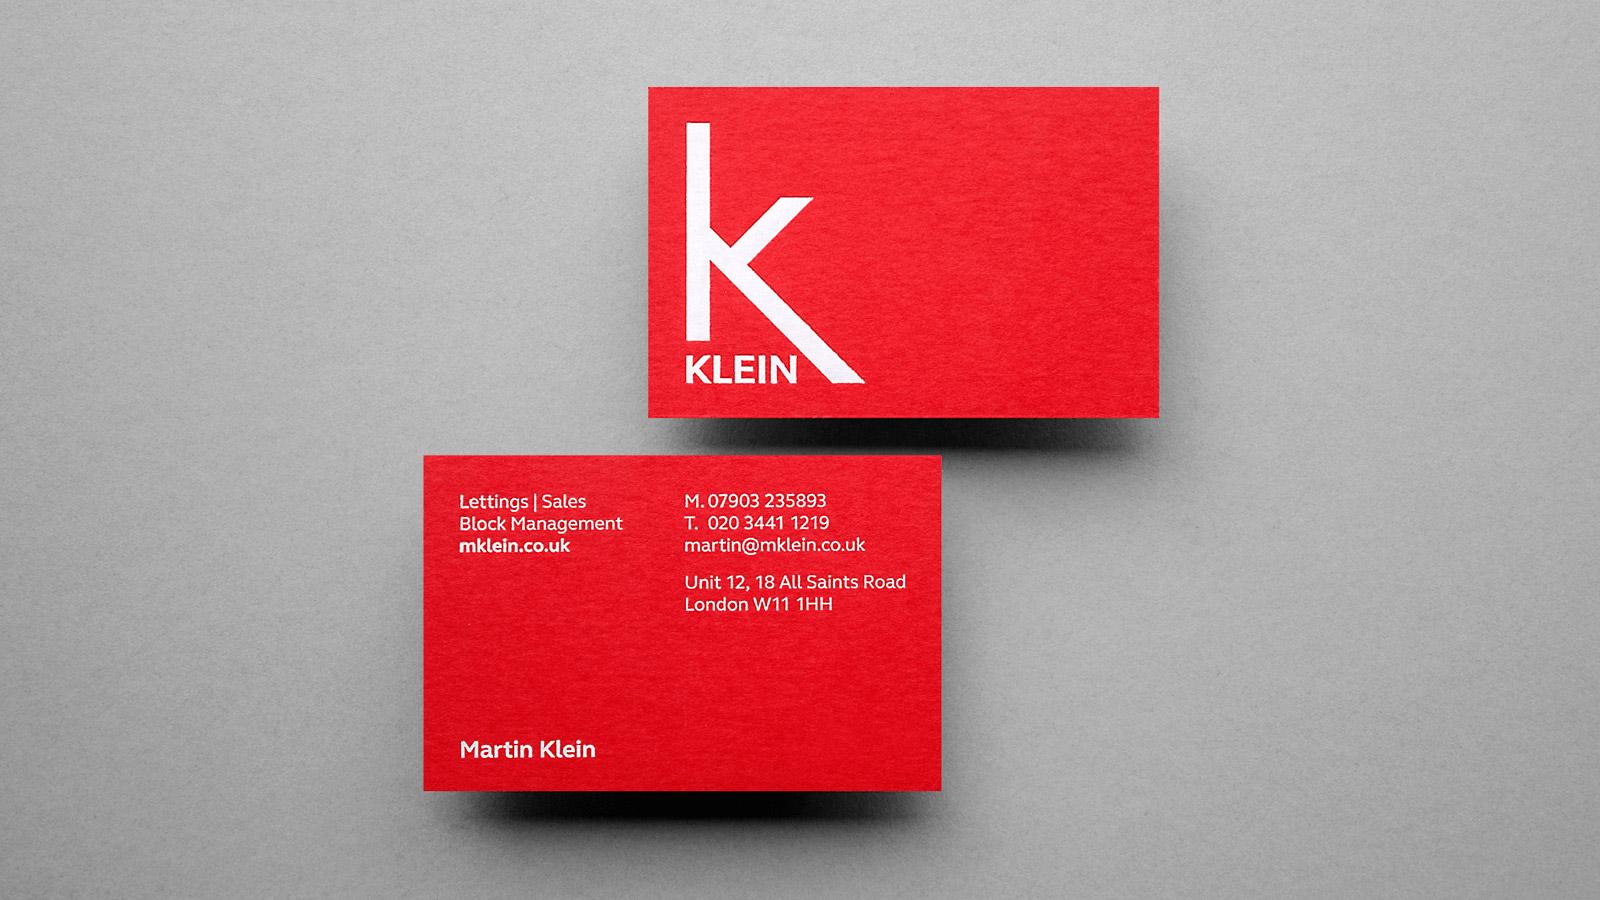 property-agency-visual-branding-identity-design-milton-keynes-london-8